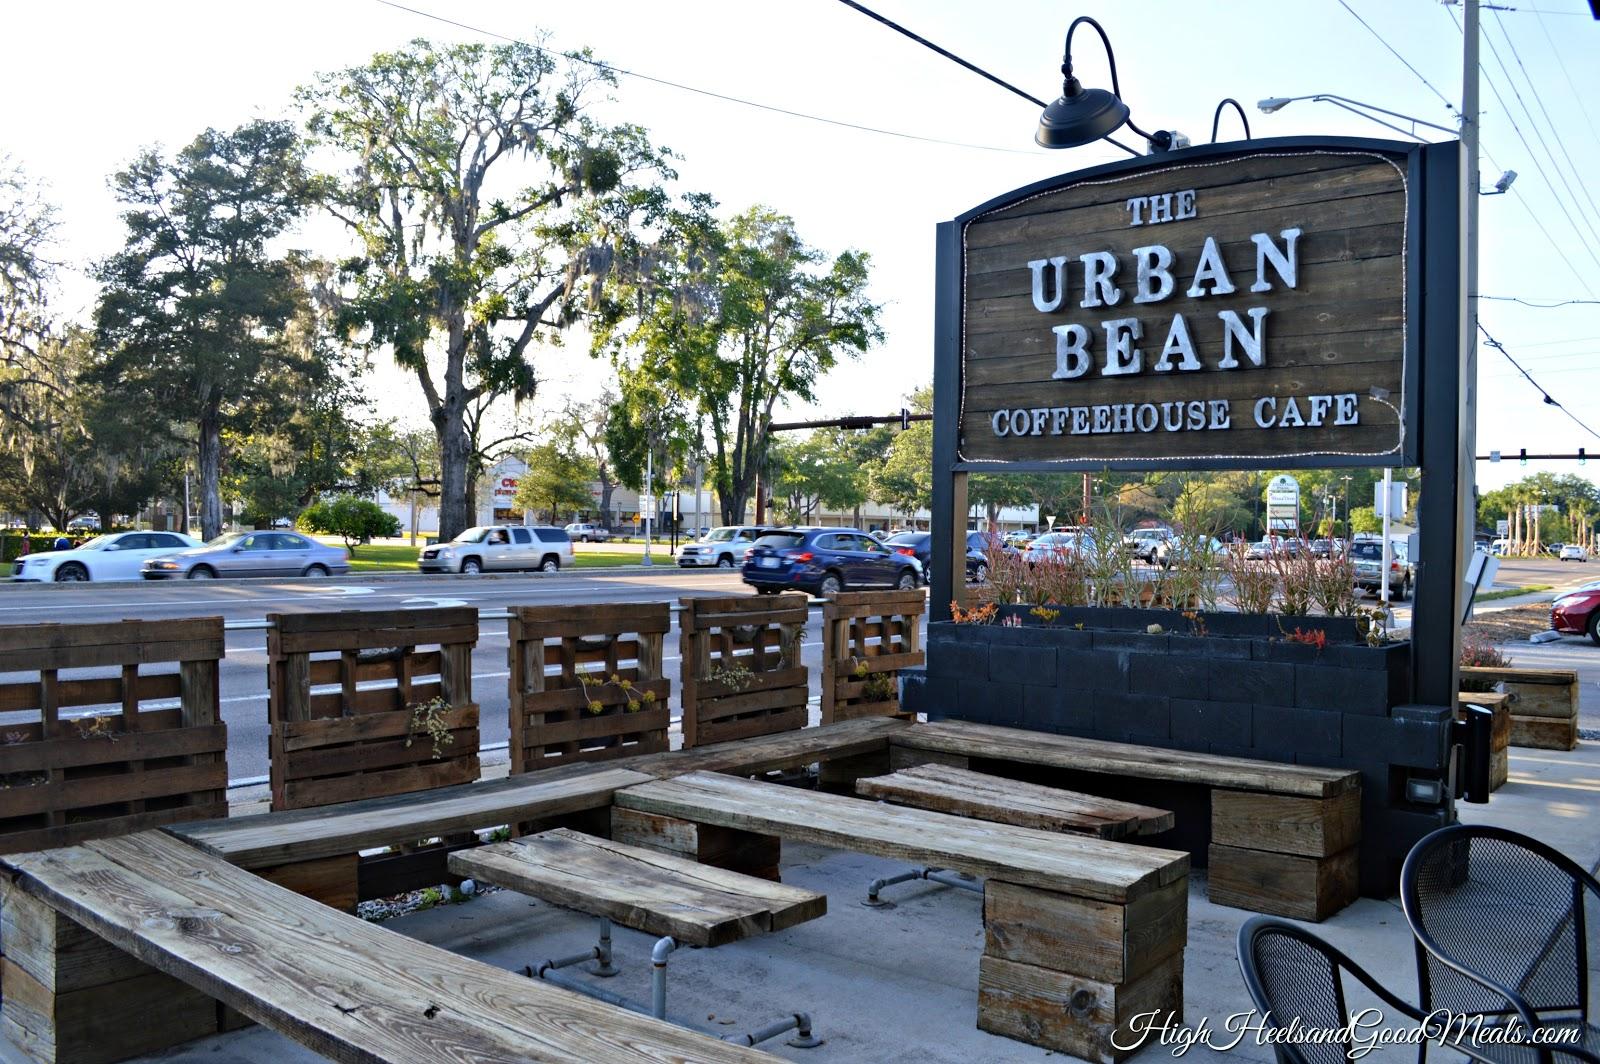 urban bean coffeehouse cafe high heels good meals